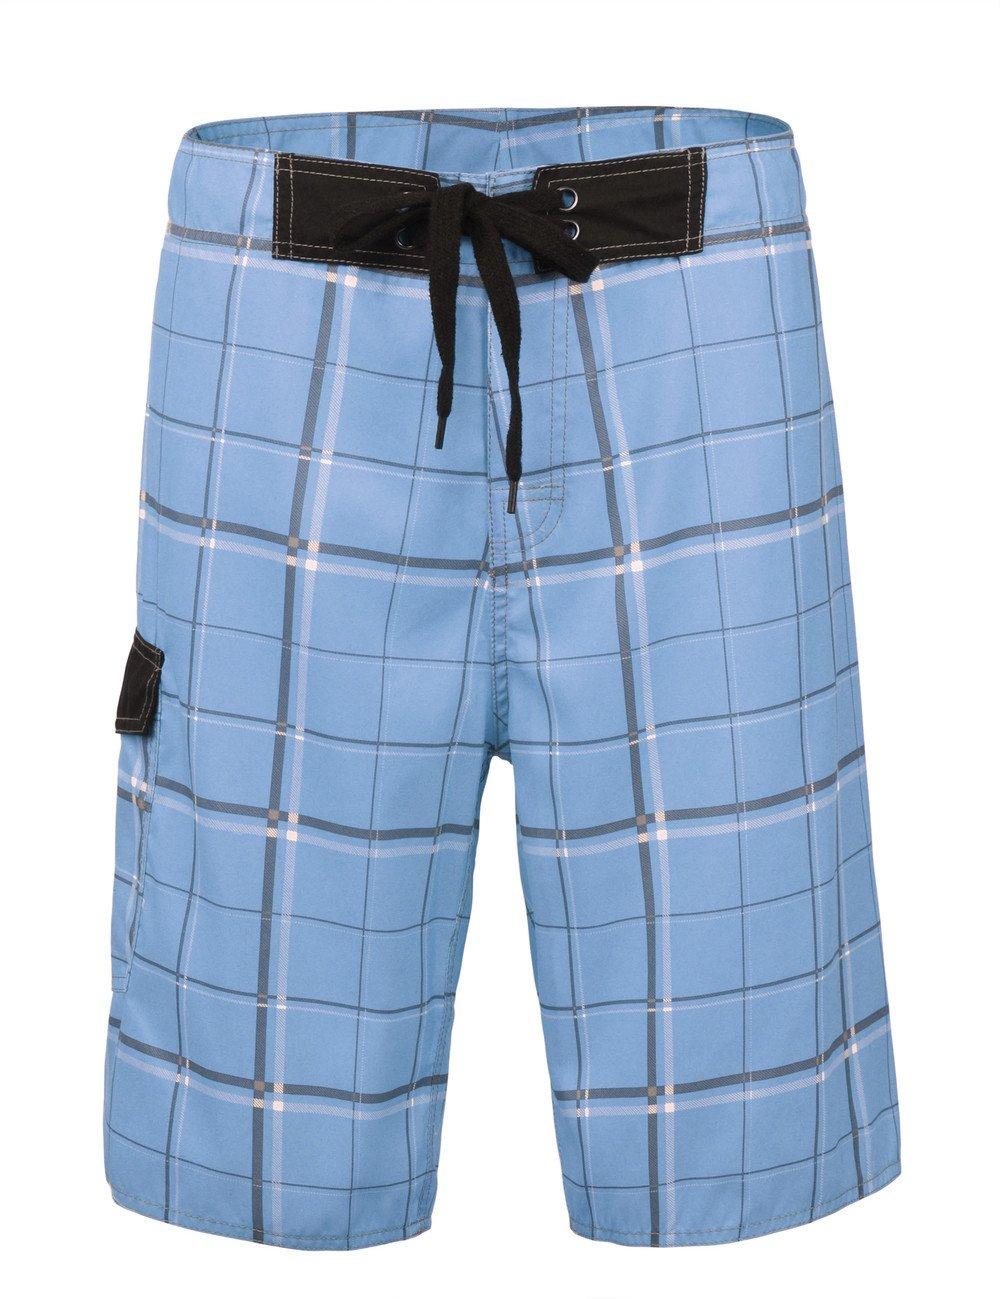 Nonwe Men's Beachwear Swim Trunks Quick Dry Plaid Pattern with Lining JF16139